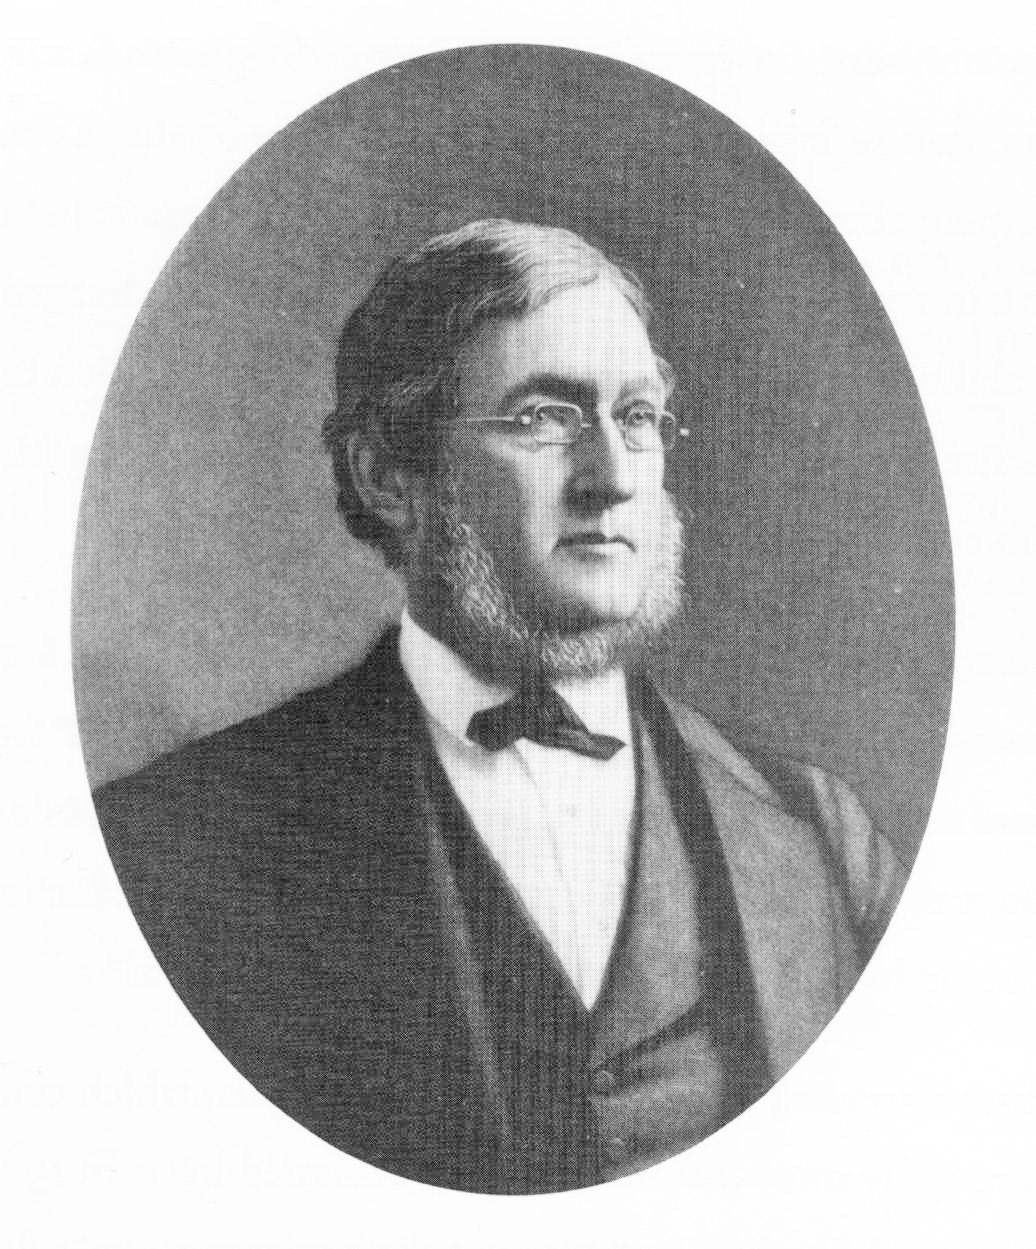 Edward Clark, about age 60.